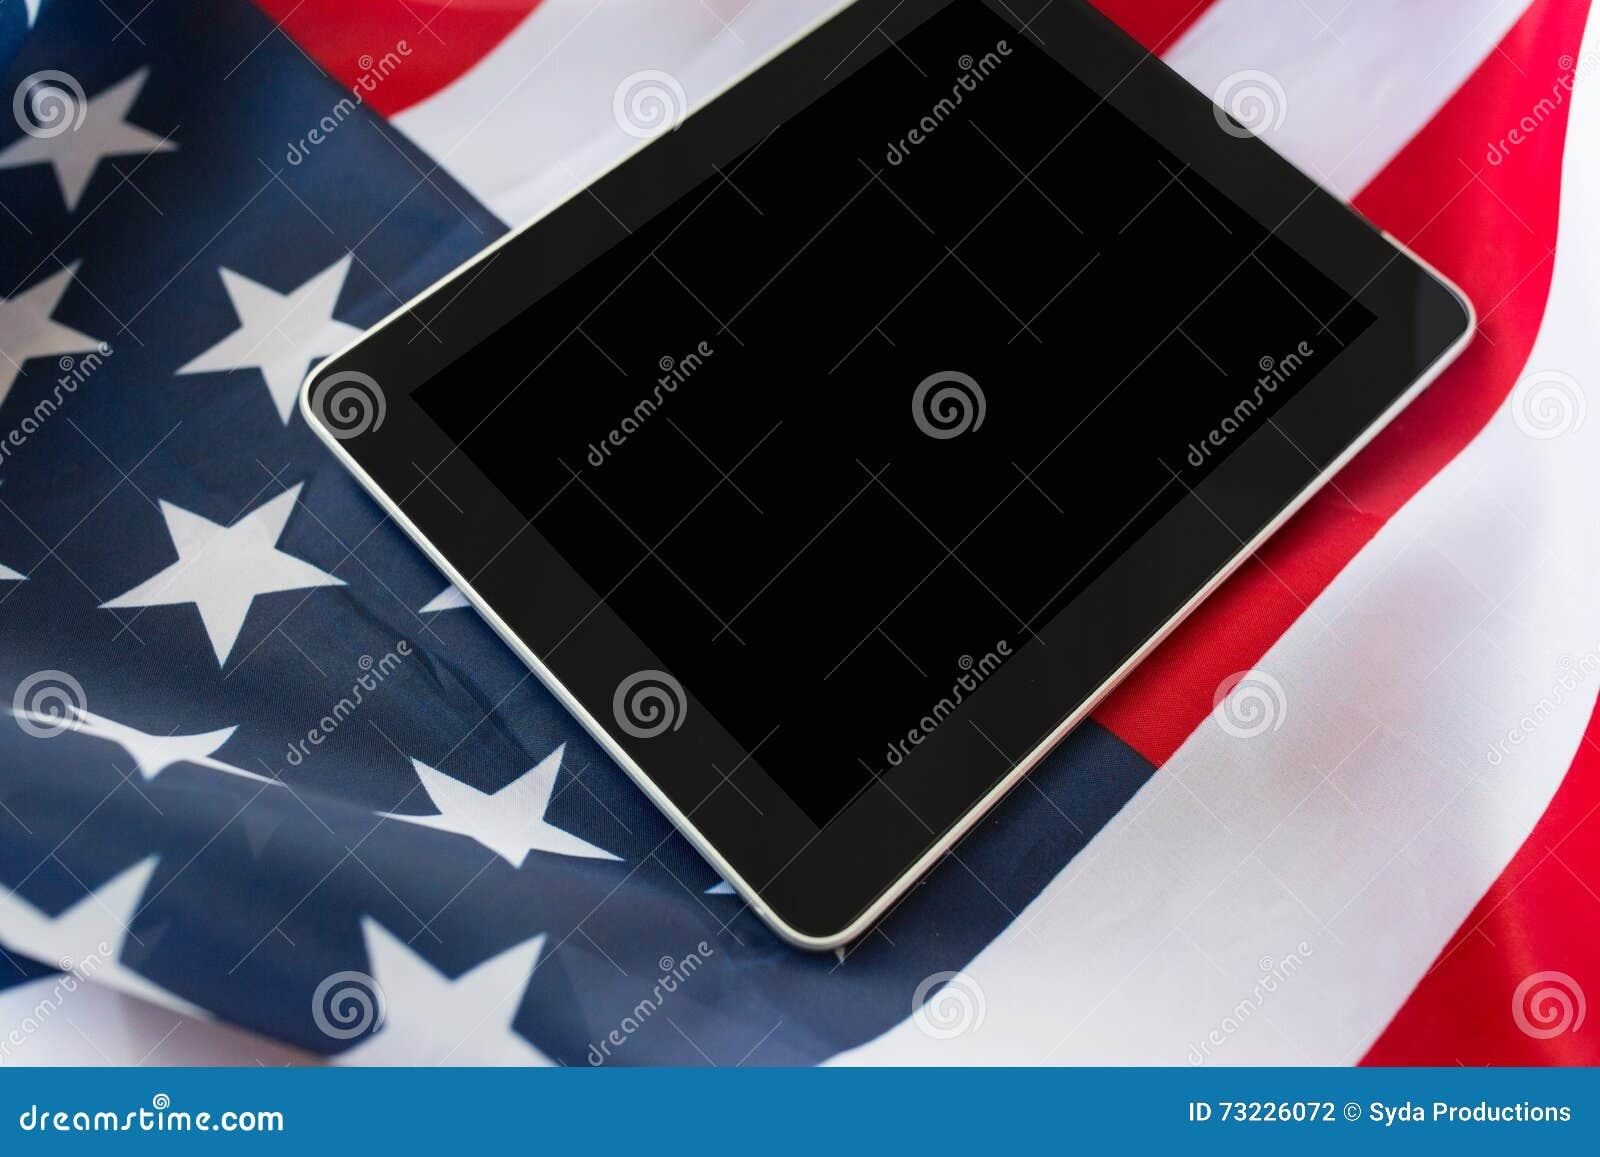 Zamyka up pastylka komputeru osobistego komputer na flaga amerykańskiej